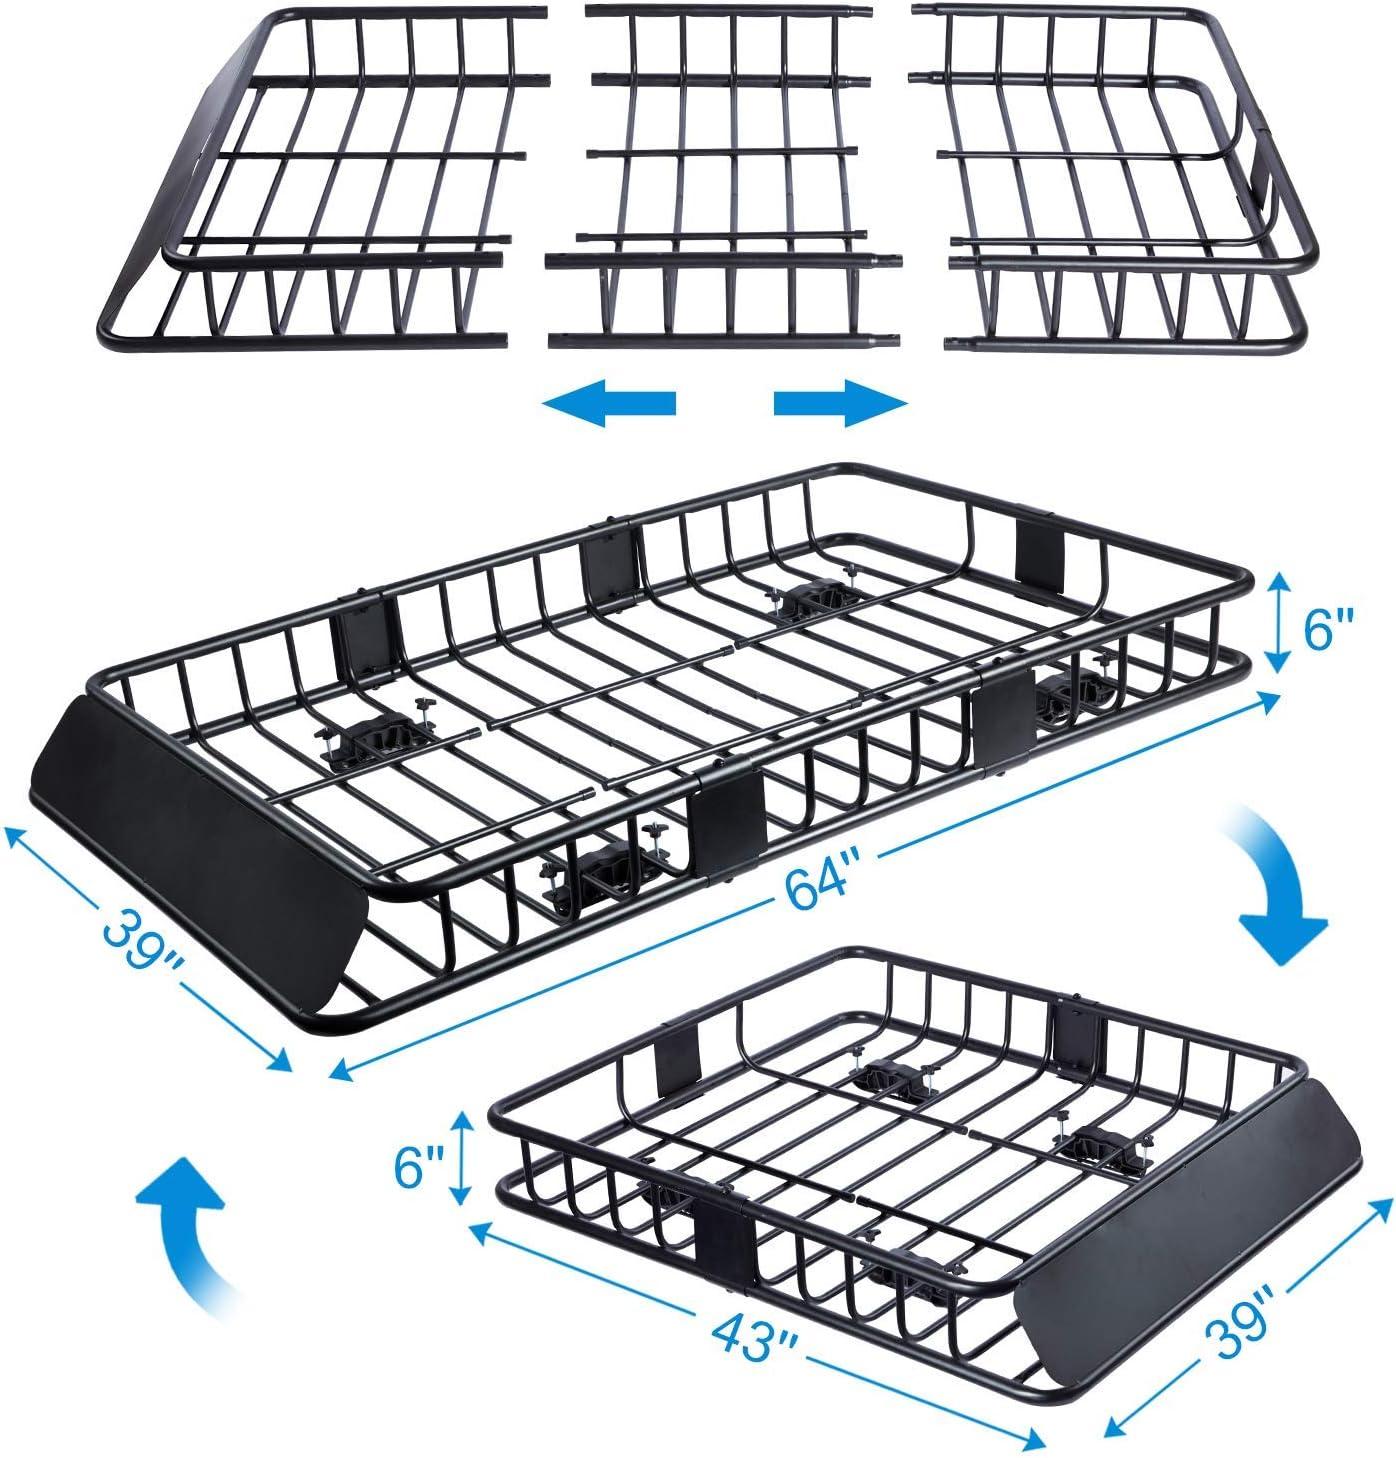 Top Luggage Holder Basket with 250lb Capacity Tiptiper Rooftop Cargo Basket 64 43 Universal Roof Rack Cargo